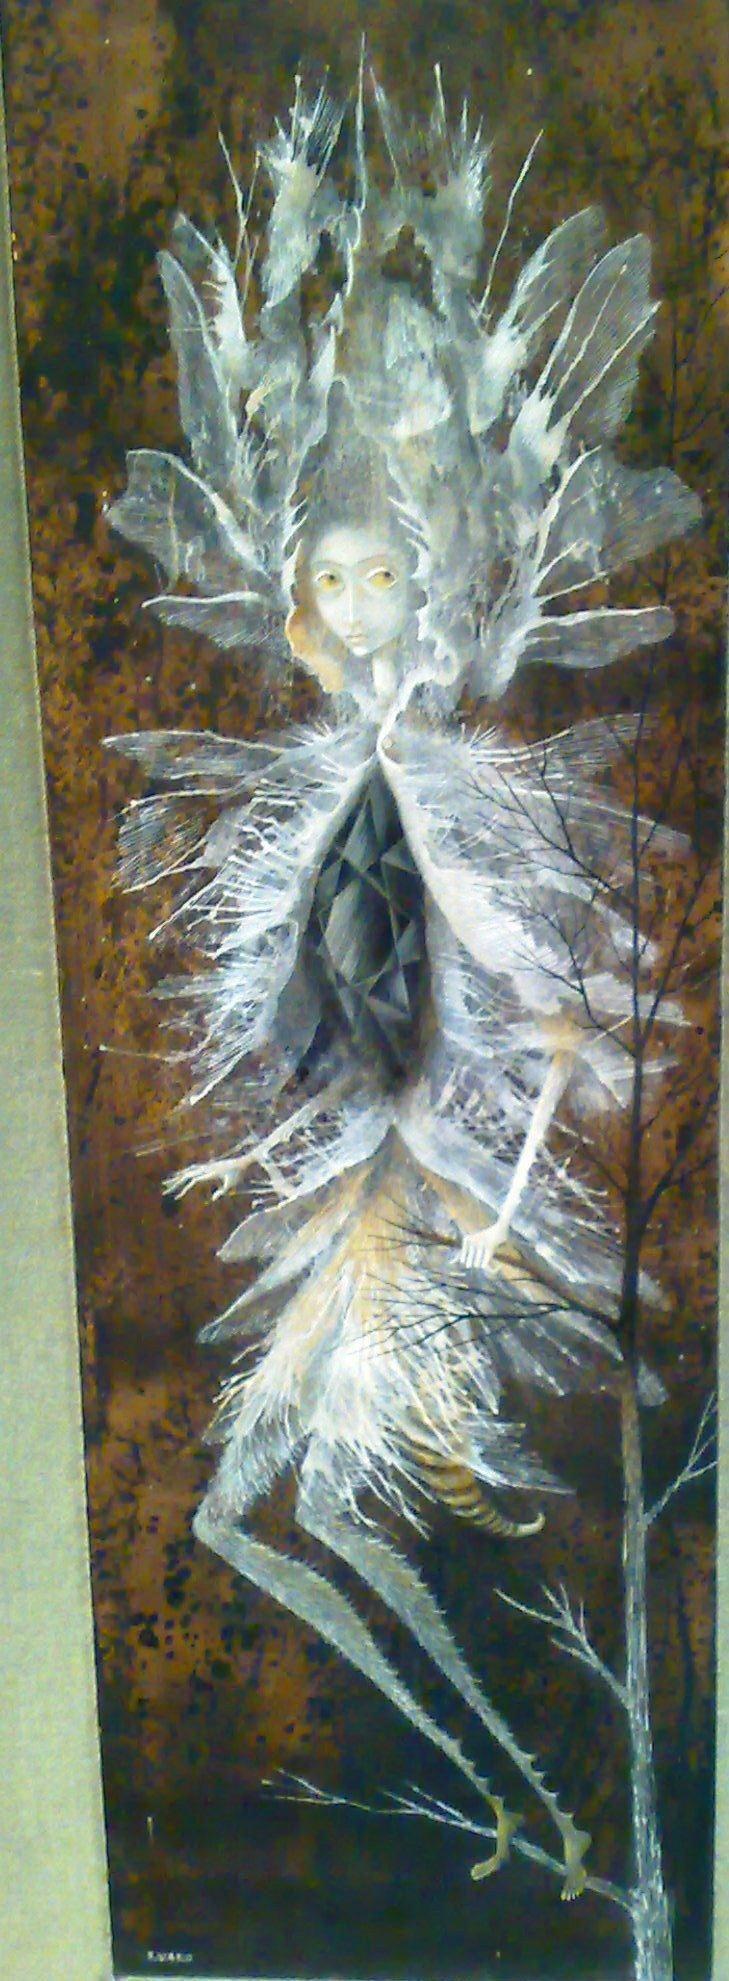 Remedios Varo: Mujer libélula.